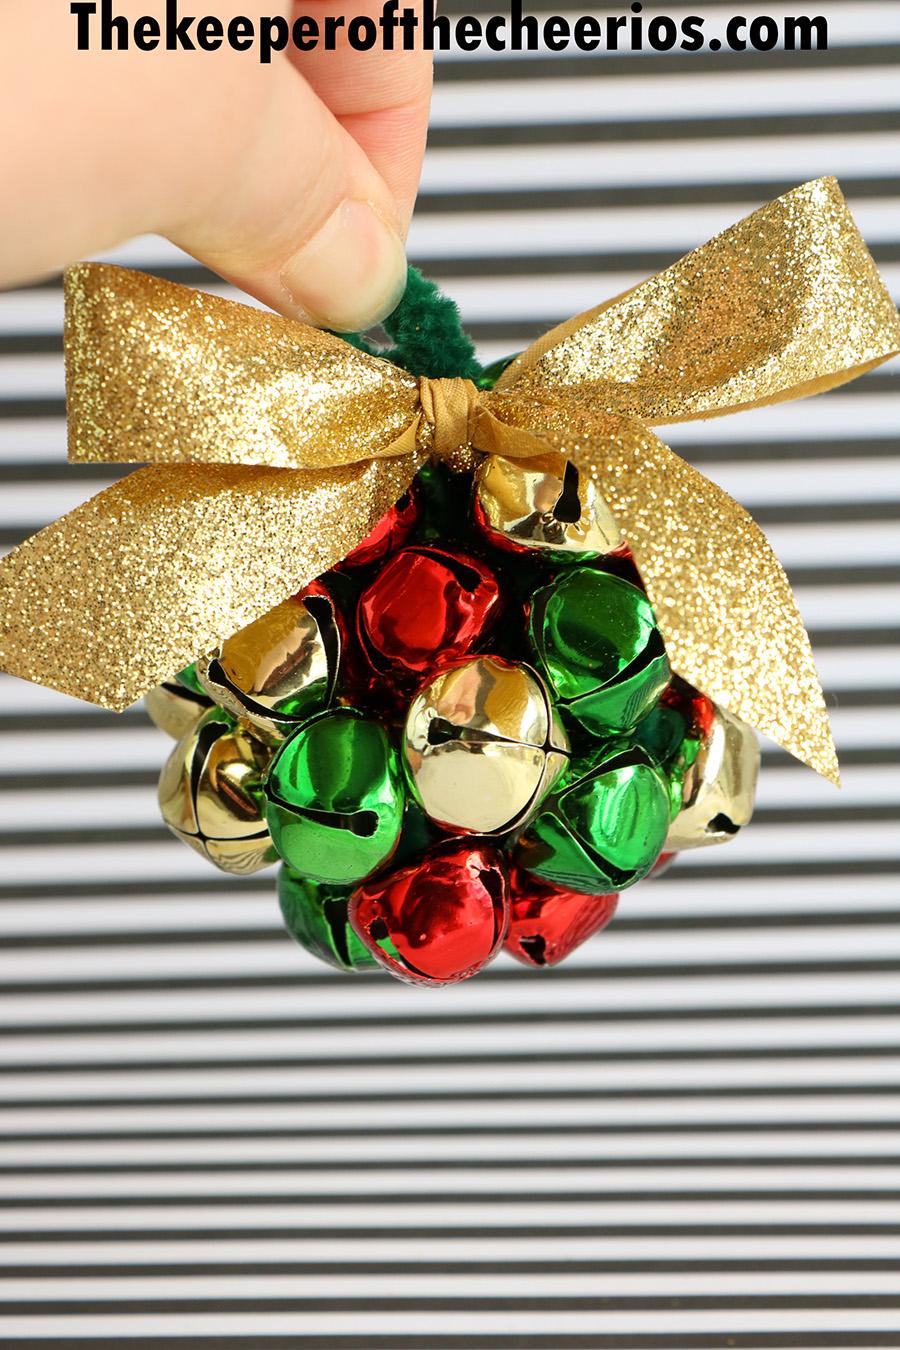 Jingle-Bells-Ball-Ornaments-12